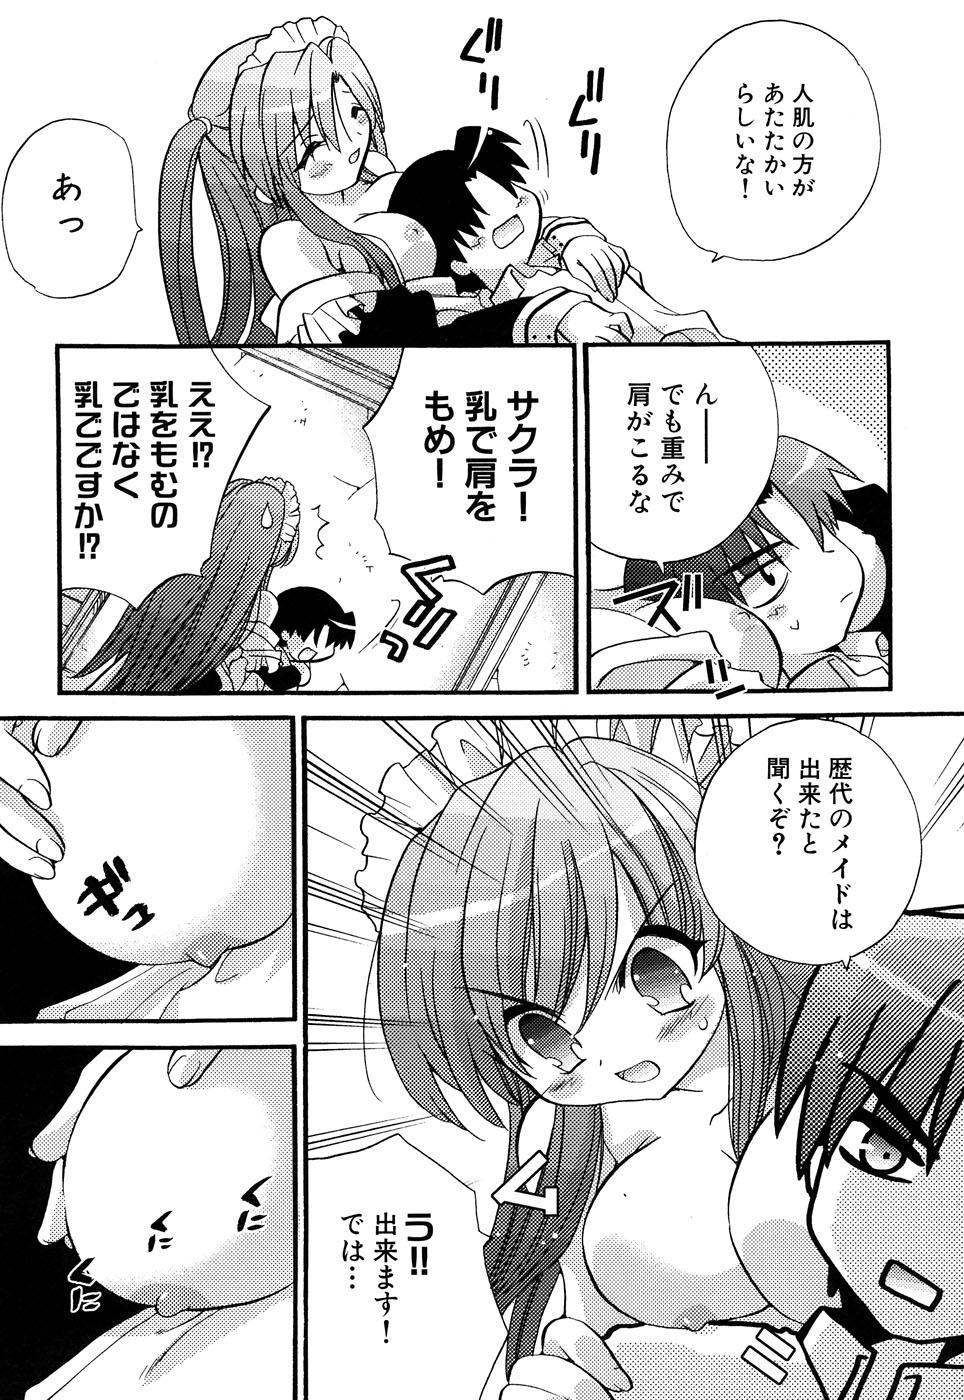 Fechikko VS Series ROUND.2 Miko San VS Maid San 129